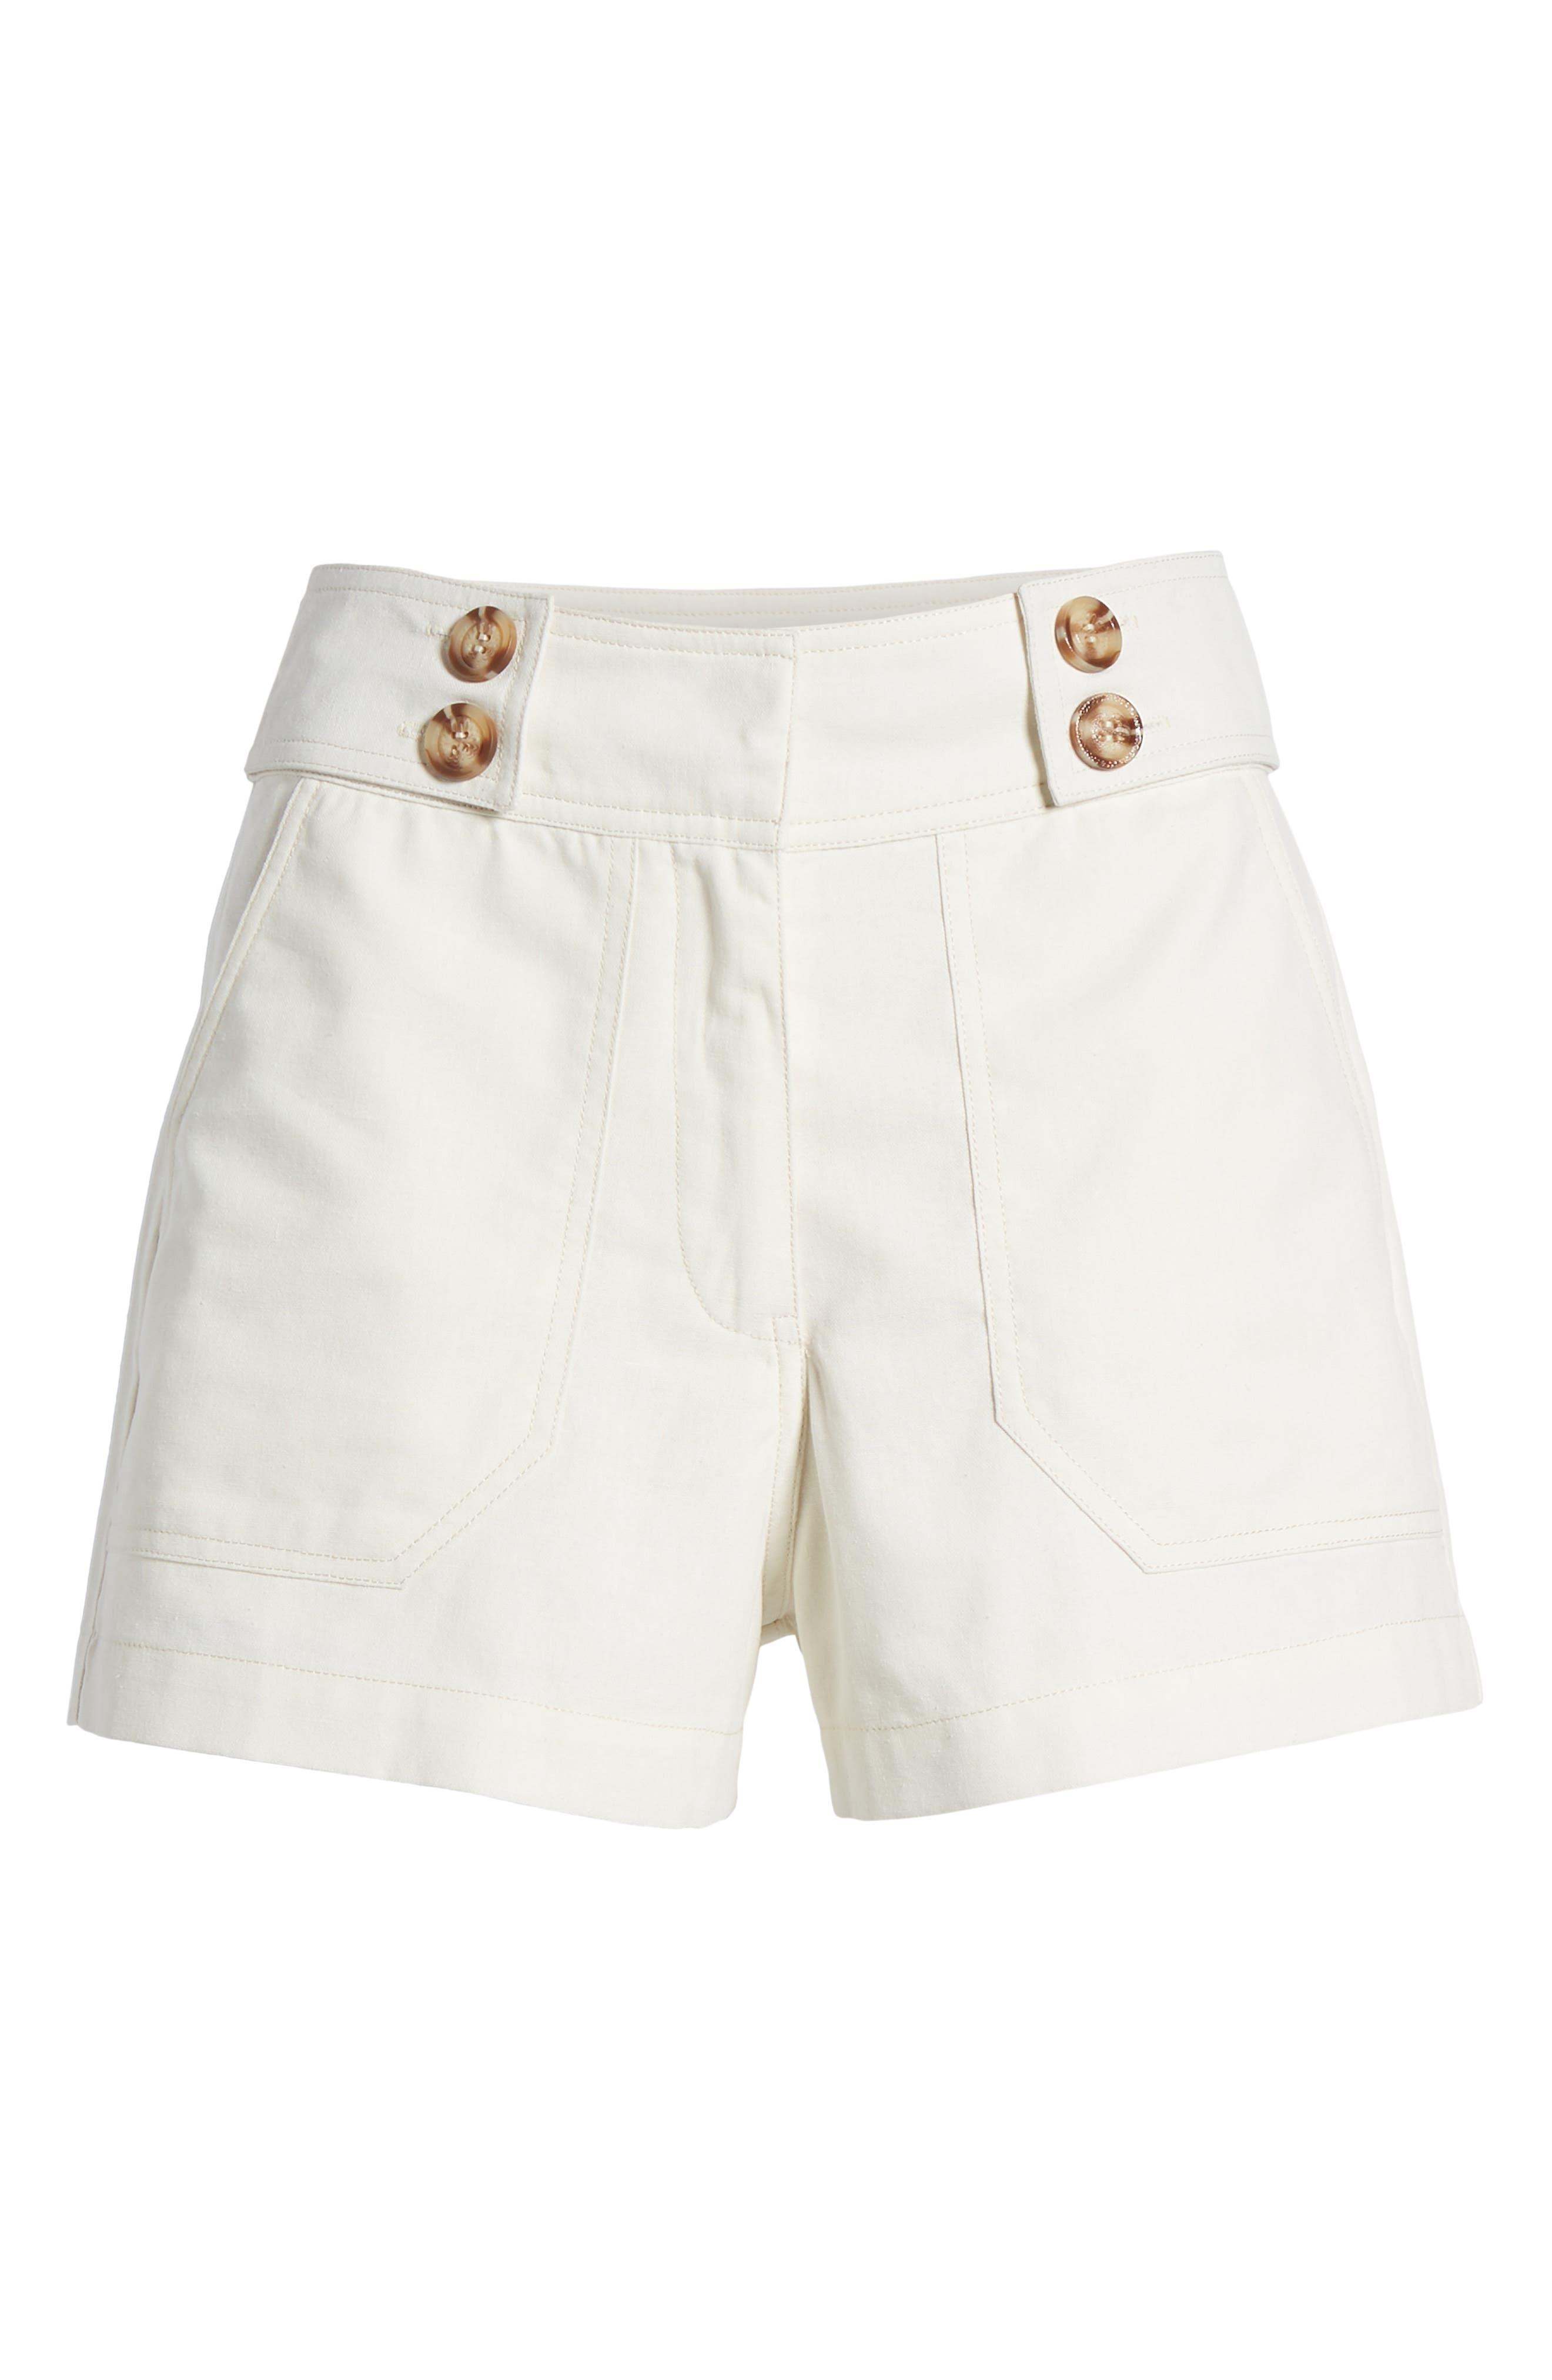 Button Tab Shorts,                             Alternate thumbnail 7, color,